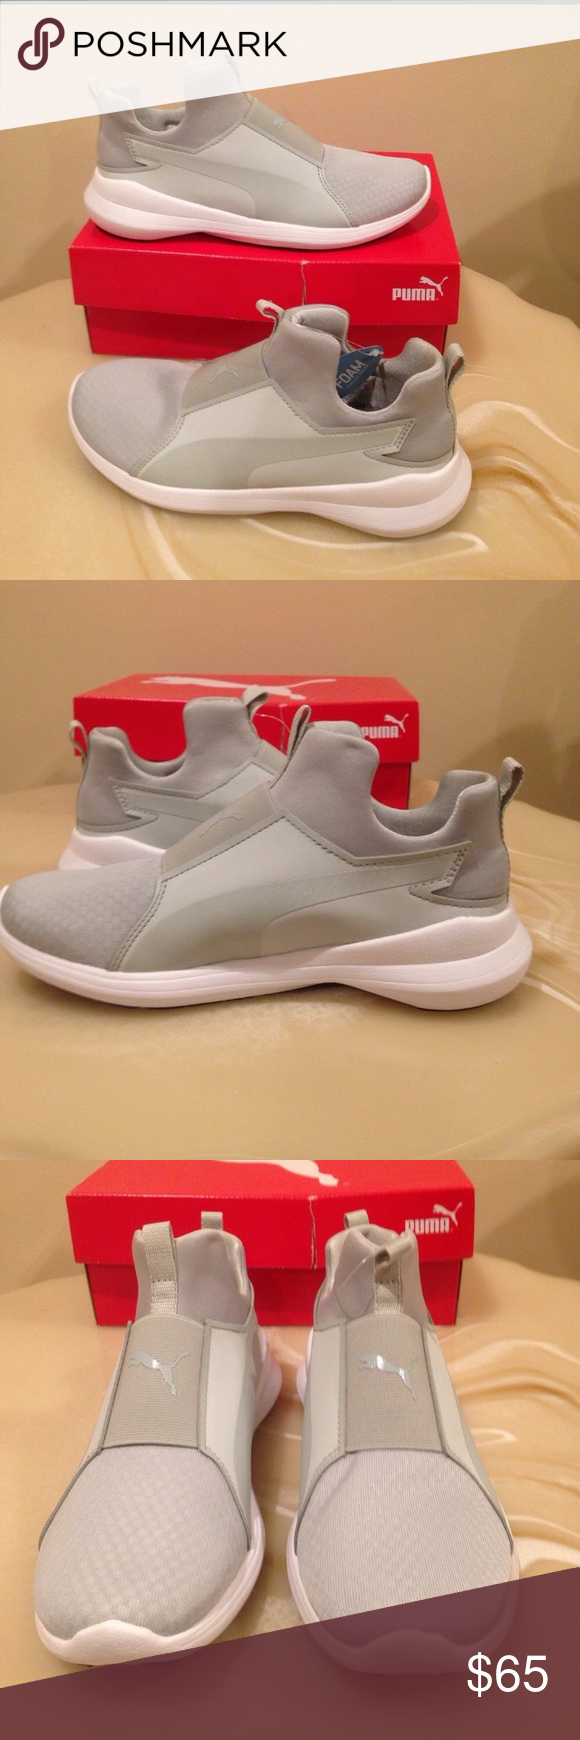 Women's Nib Brand New Stylish Puma Shoes Foam Soft drUXPzrq